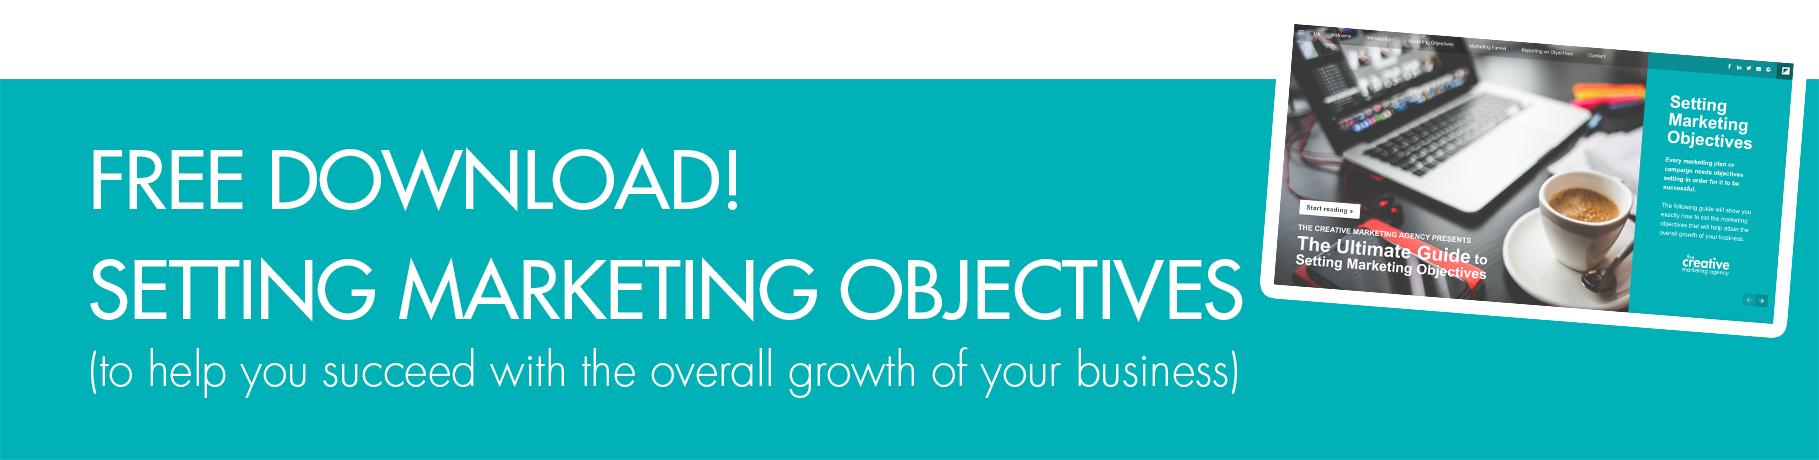 Setting marketing objectives